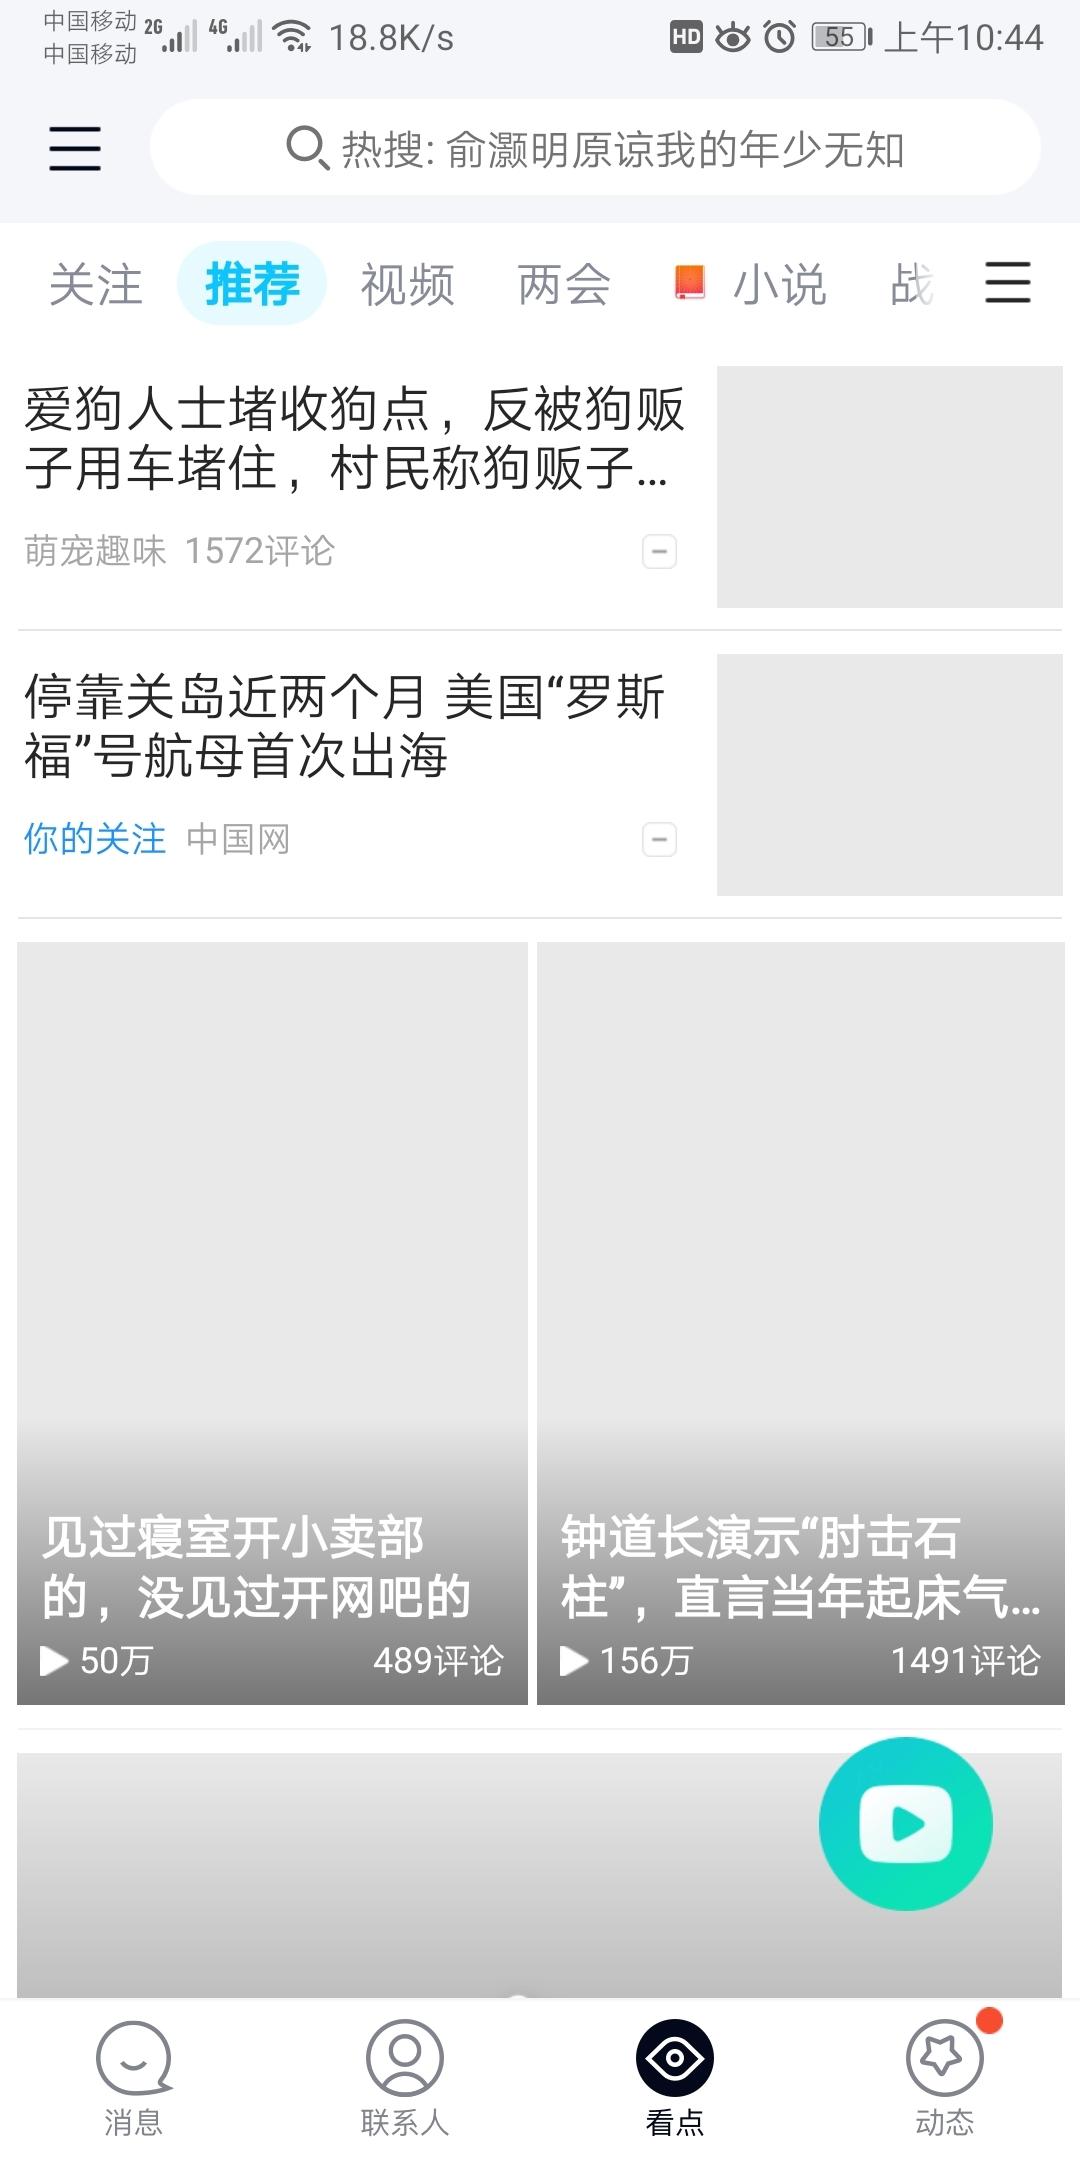 Screenshot_20200521_104408_com.tencent.mobileqq.jpg